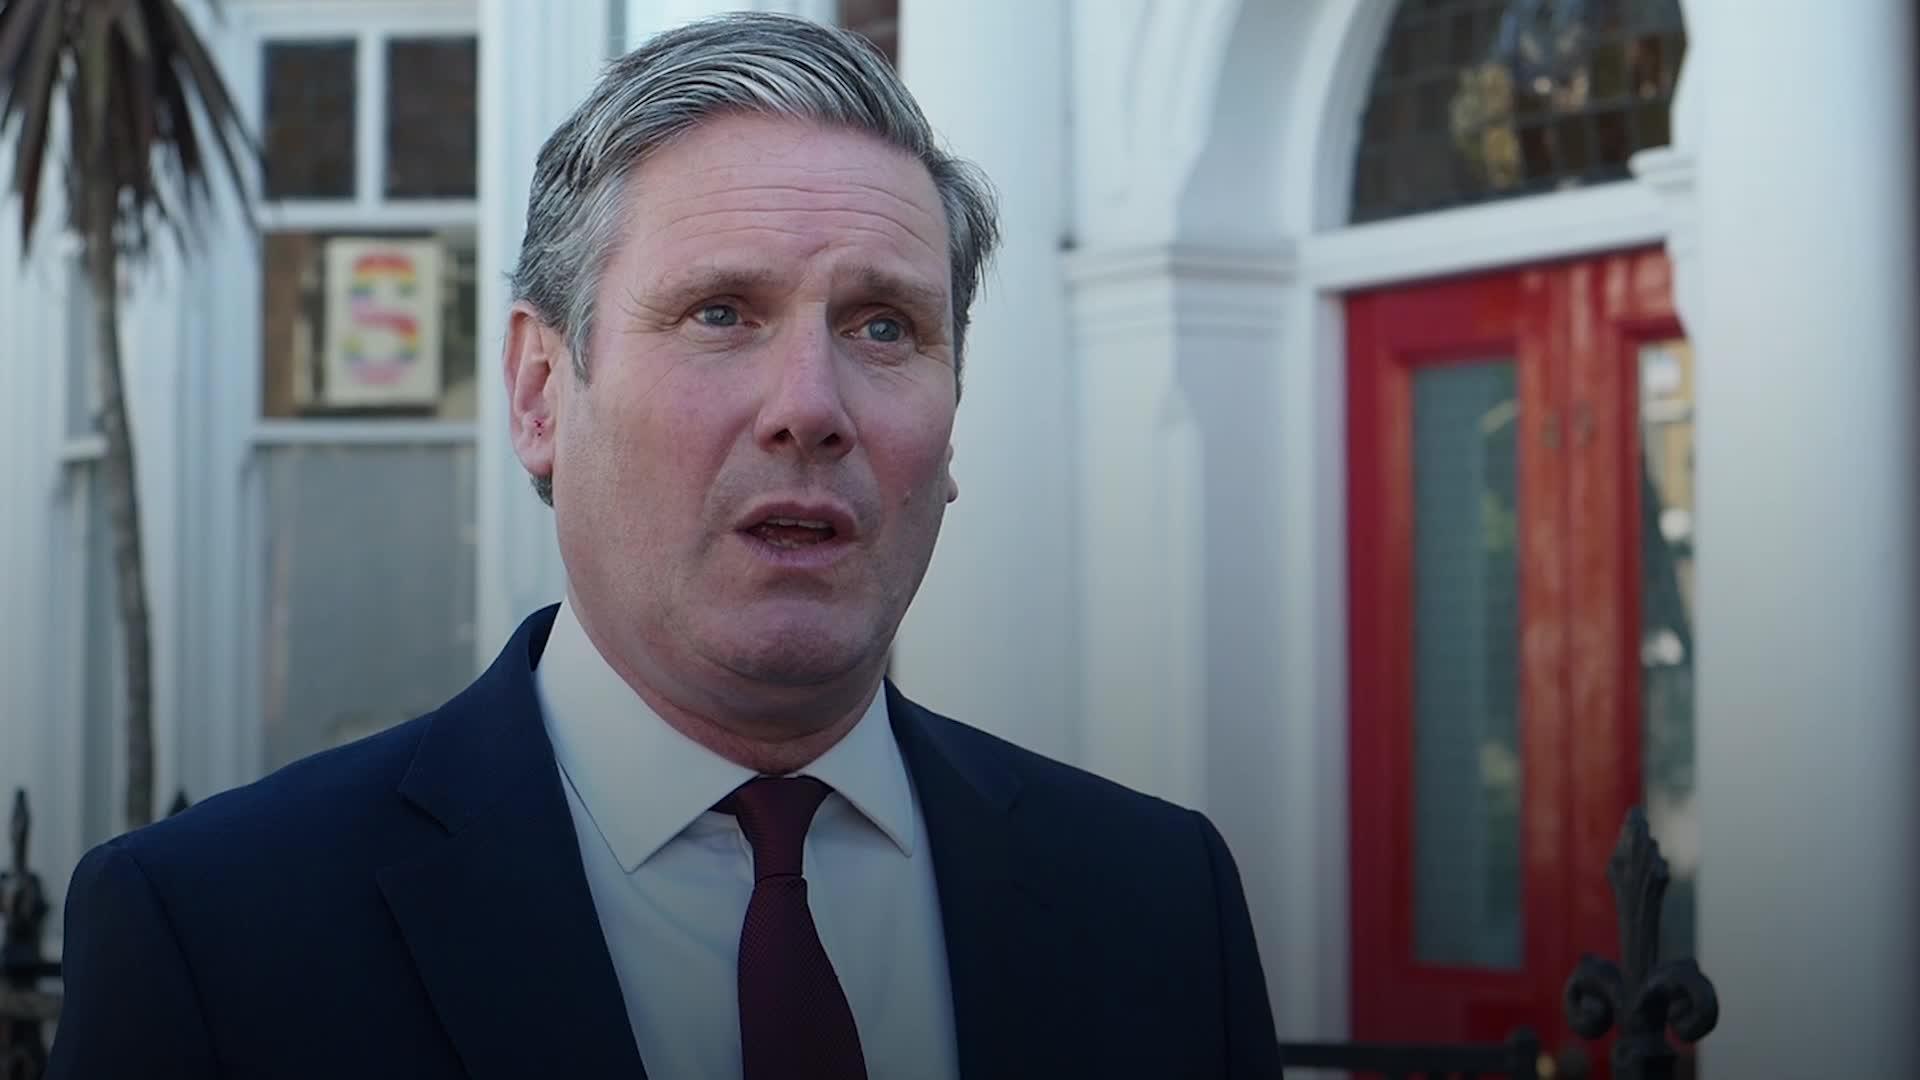 Sir Keir Starmer: Labour supports gradual easing of lockdown